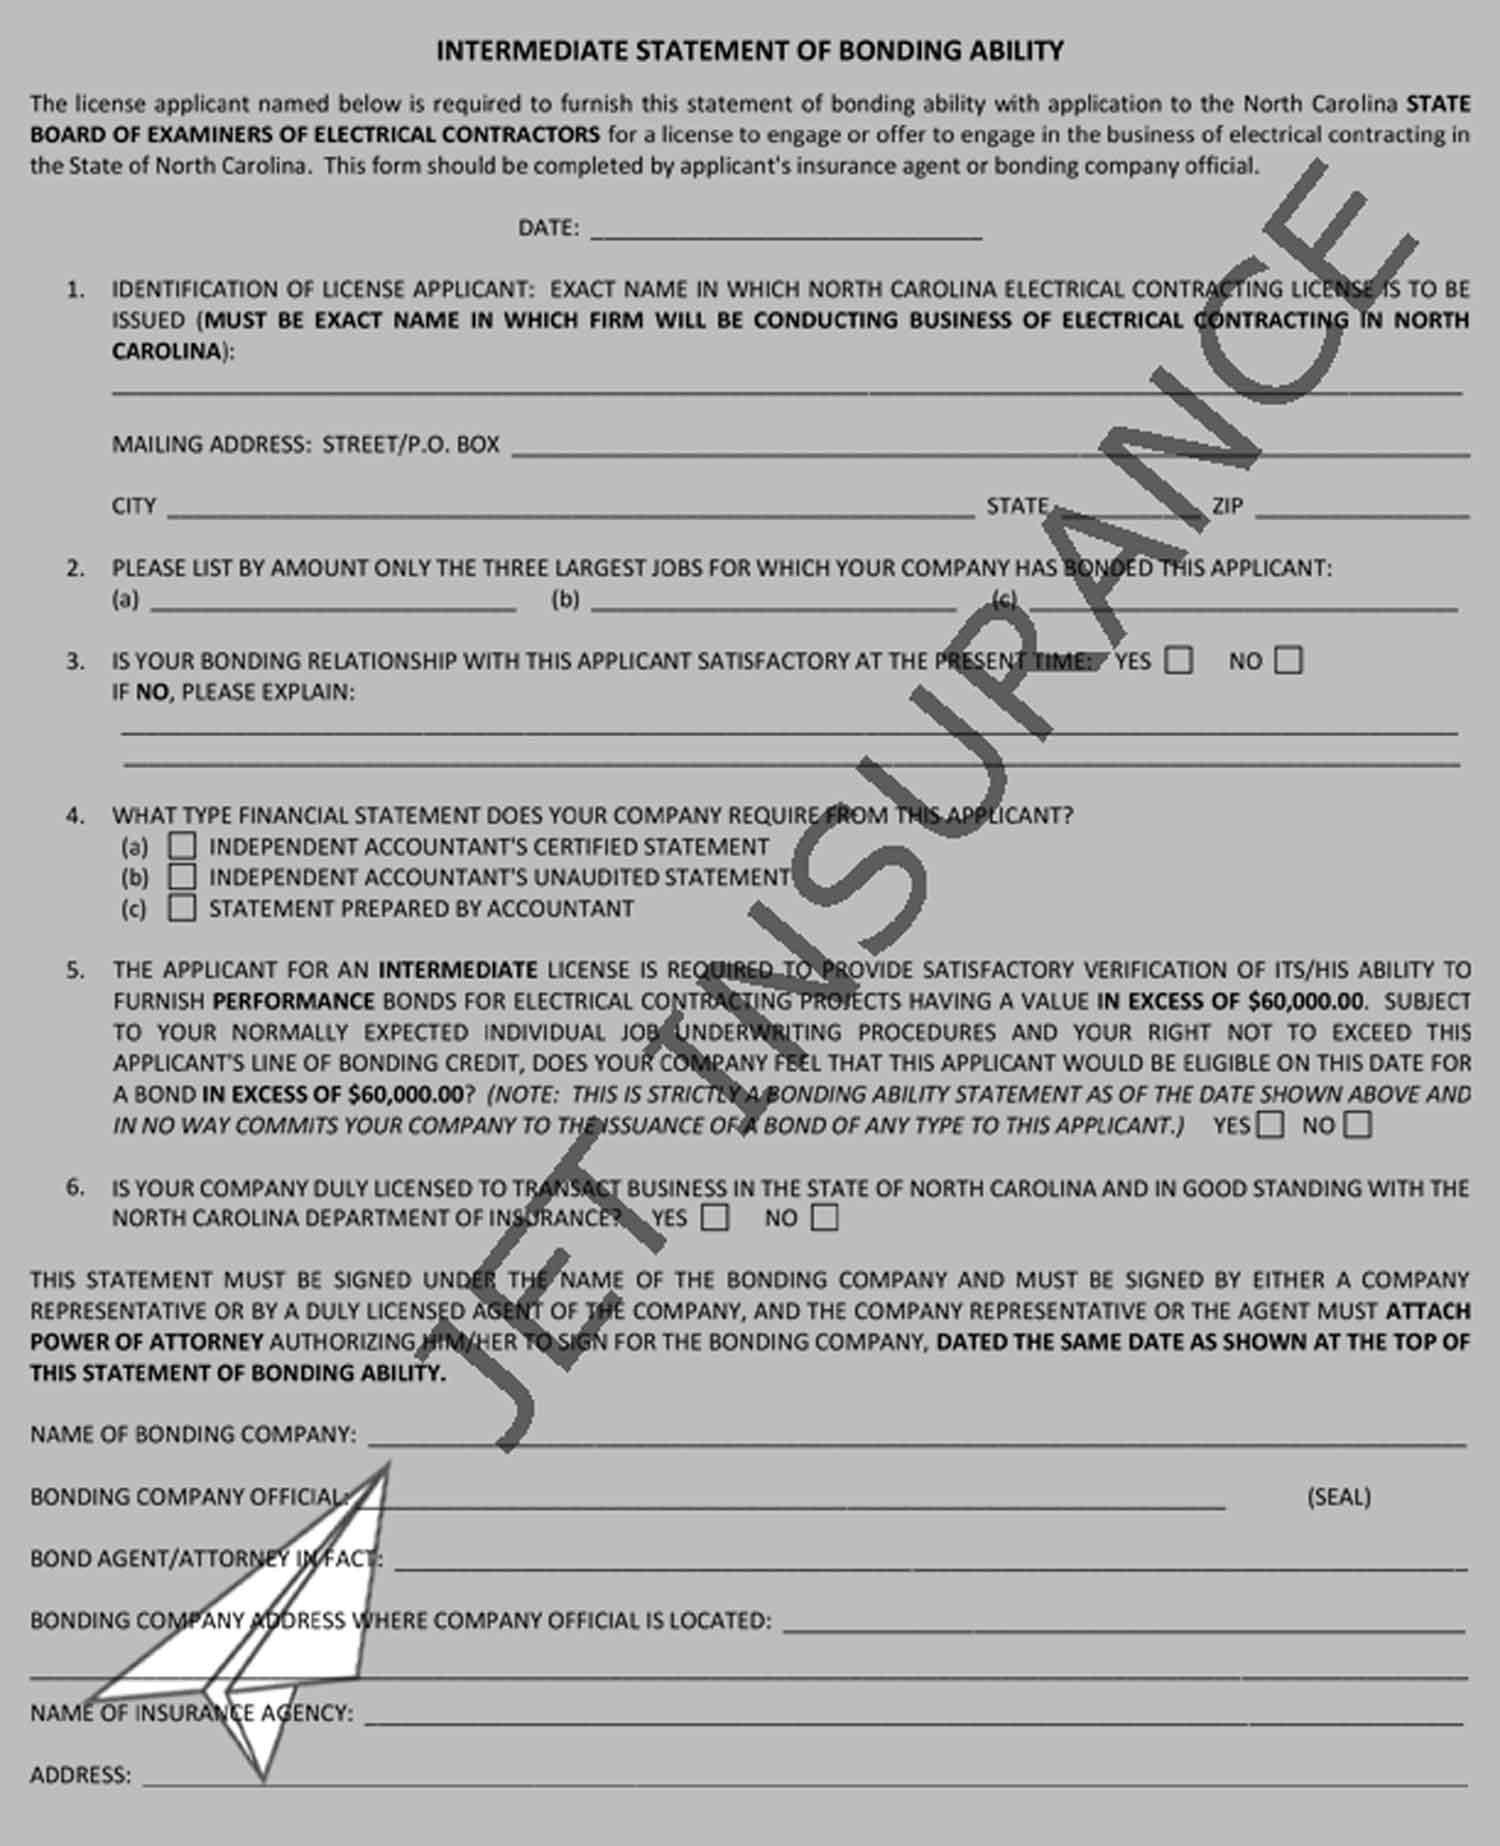 North Carolina Statement of Bonding Ability Bond Form